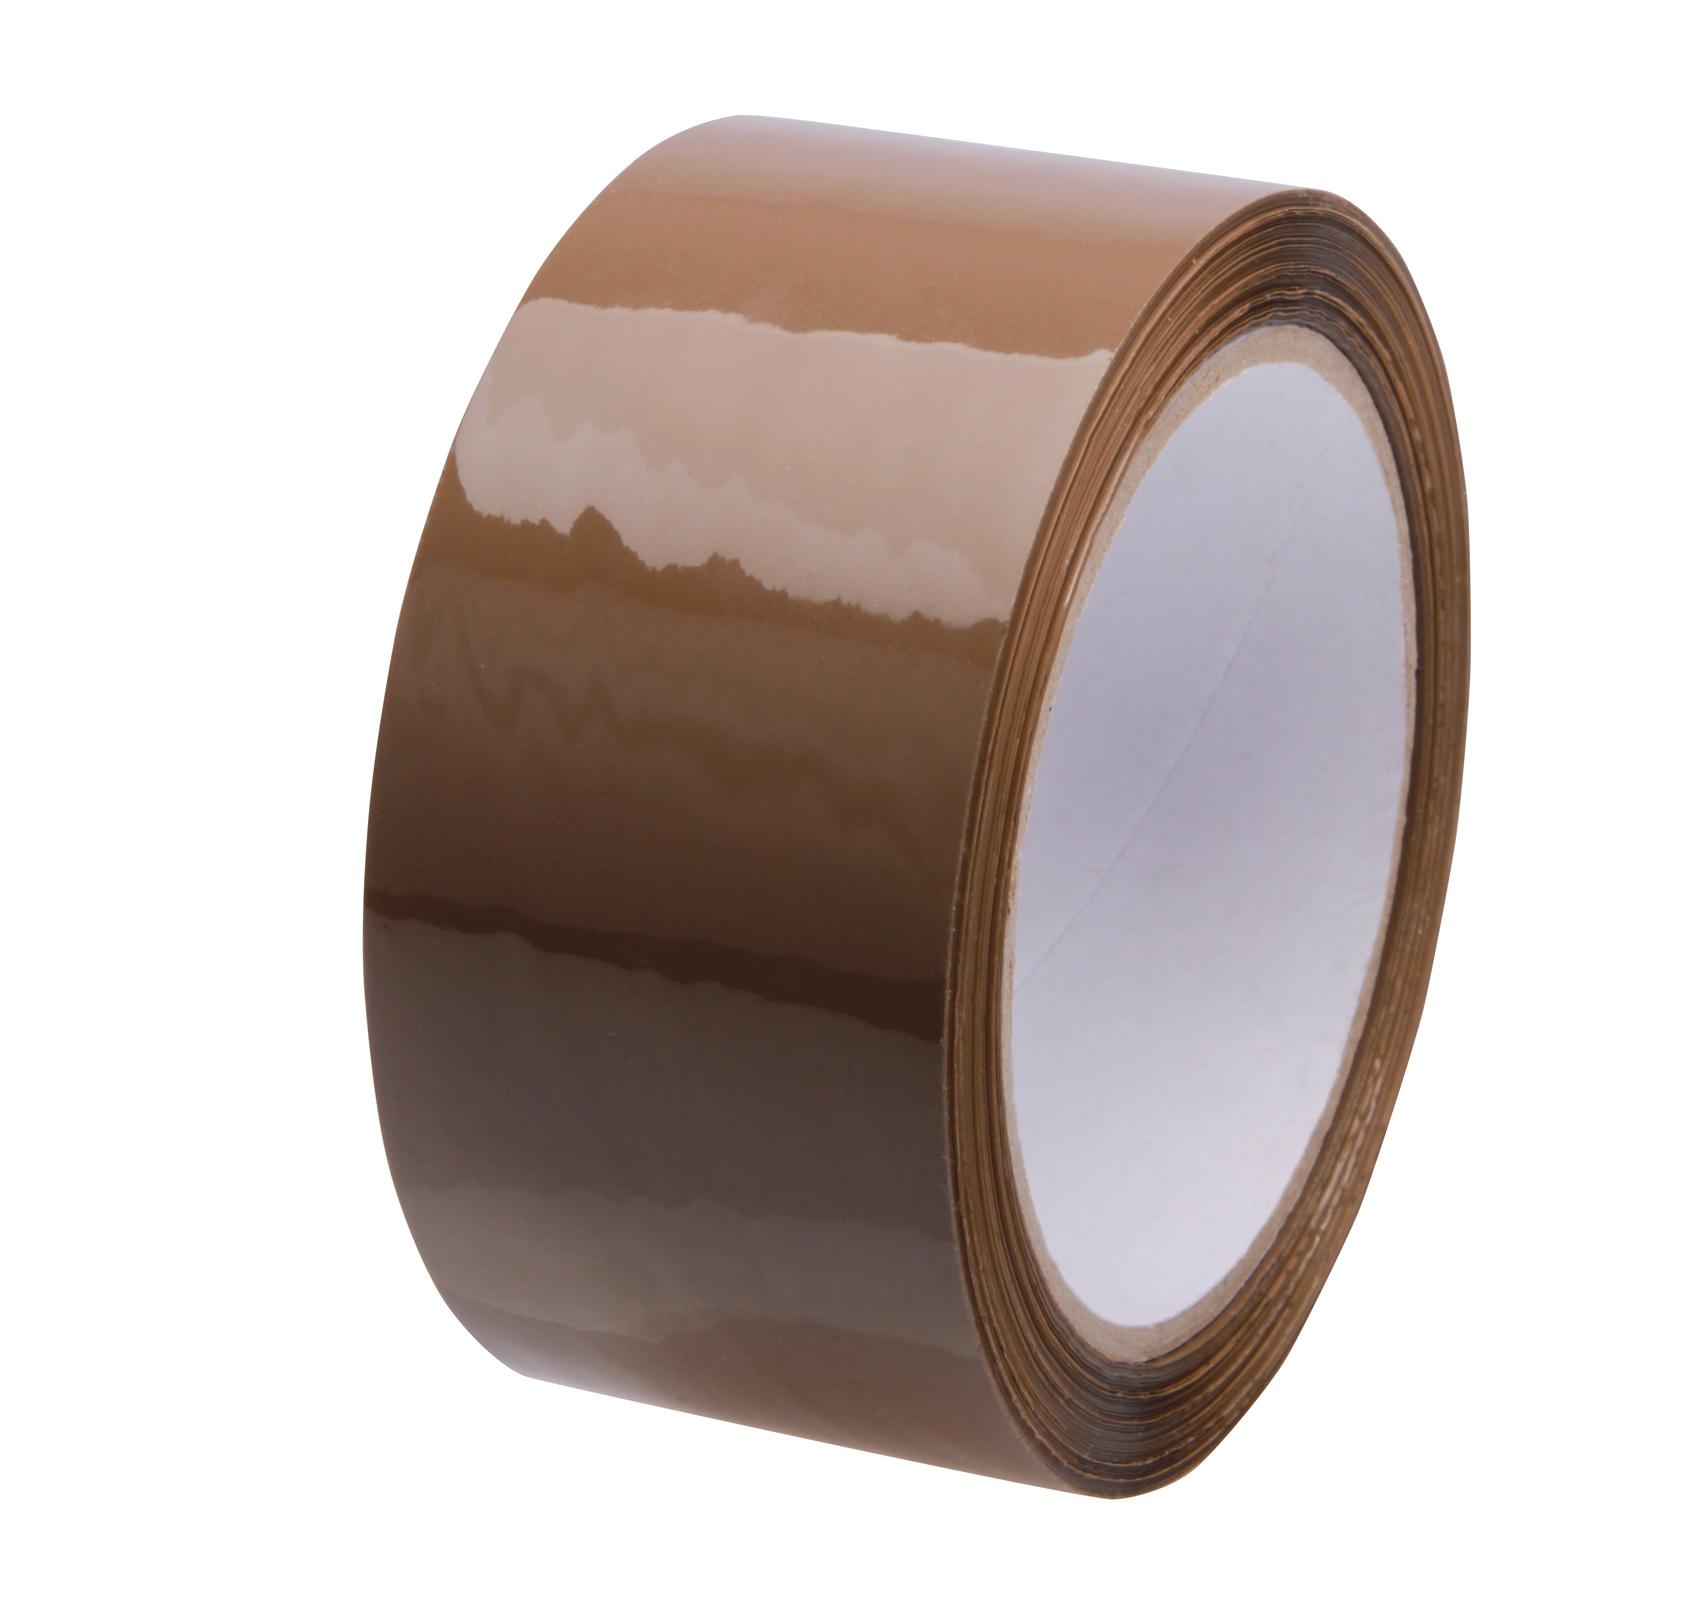 6 rollen paket klebeband braun packband neu sehr leise. Black Bedroom Furniture Sets. Home Design Ideas